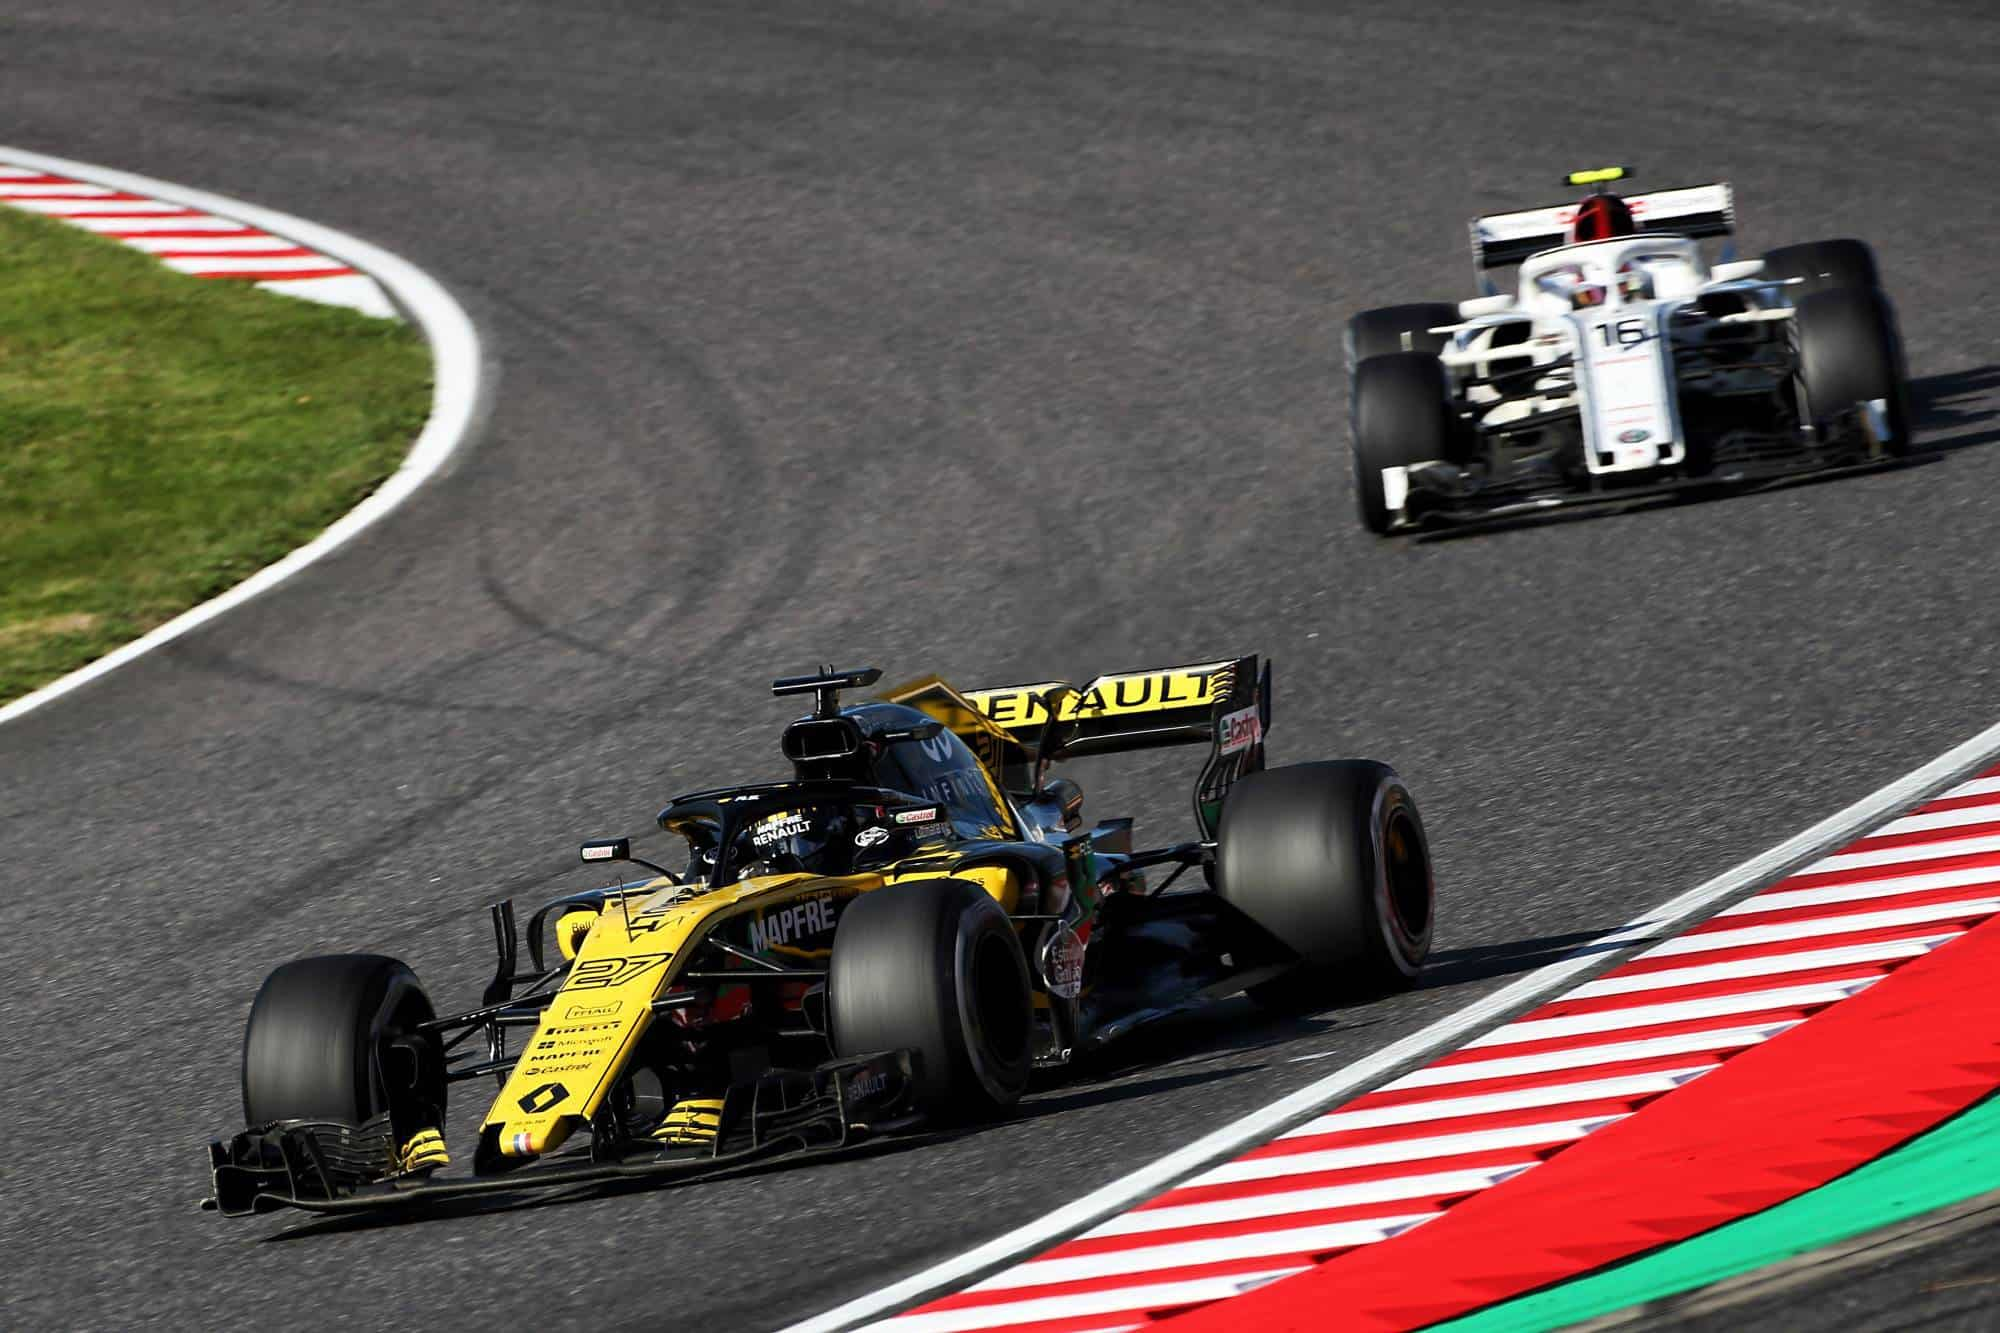 Hulkenberg Renault leads Leclerc Alfa Romeo Sauber Japanese GP F1 2018 Photo Renault